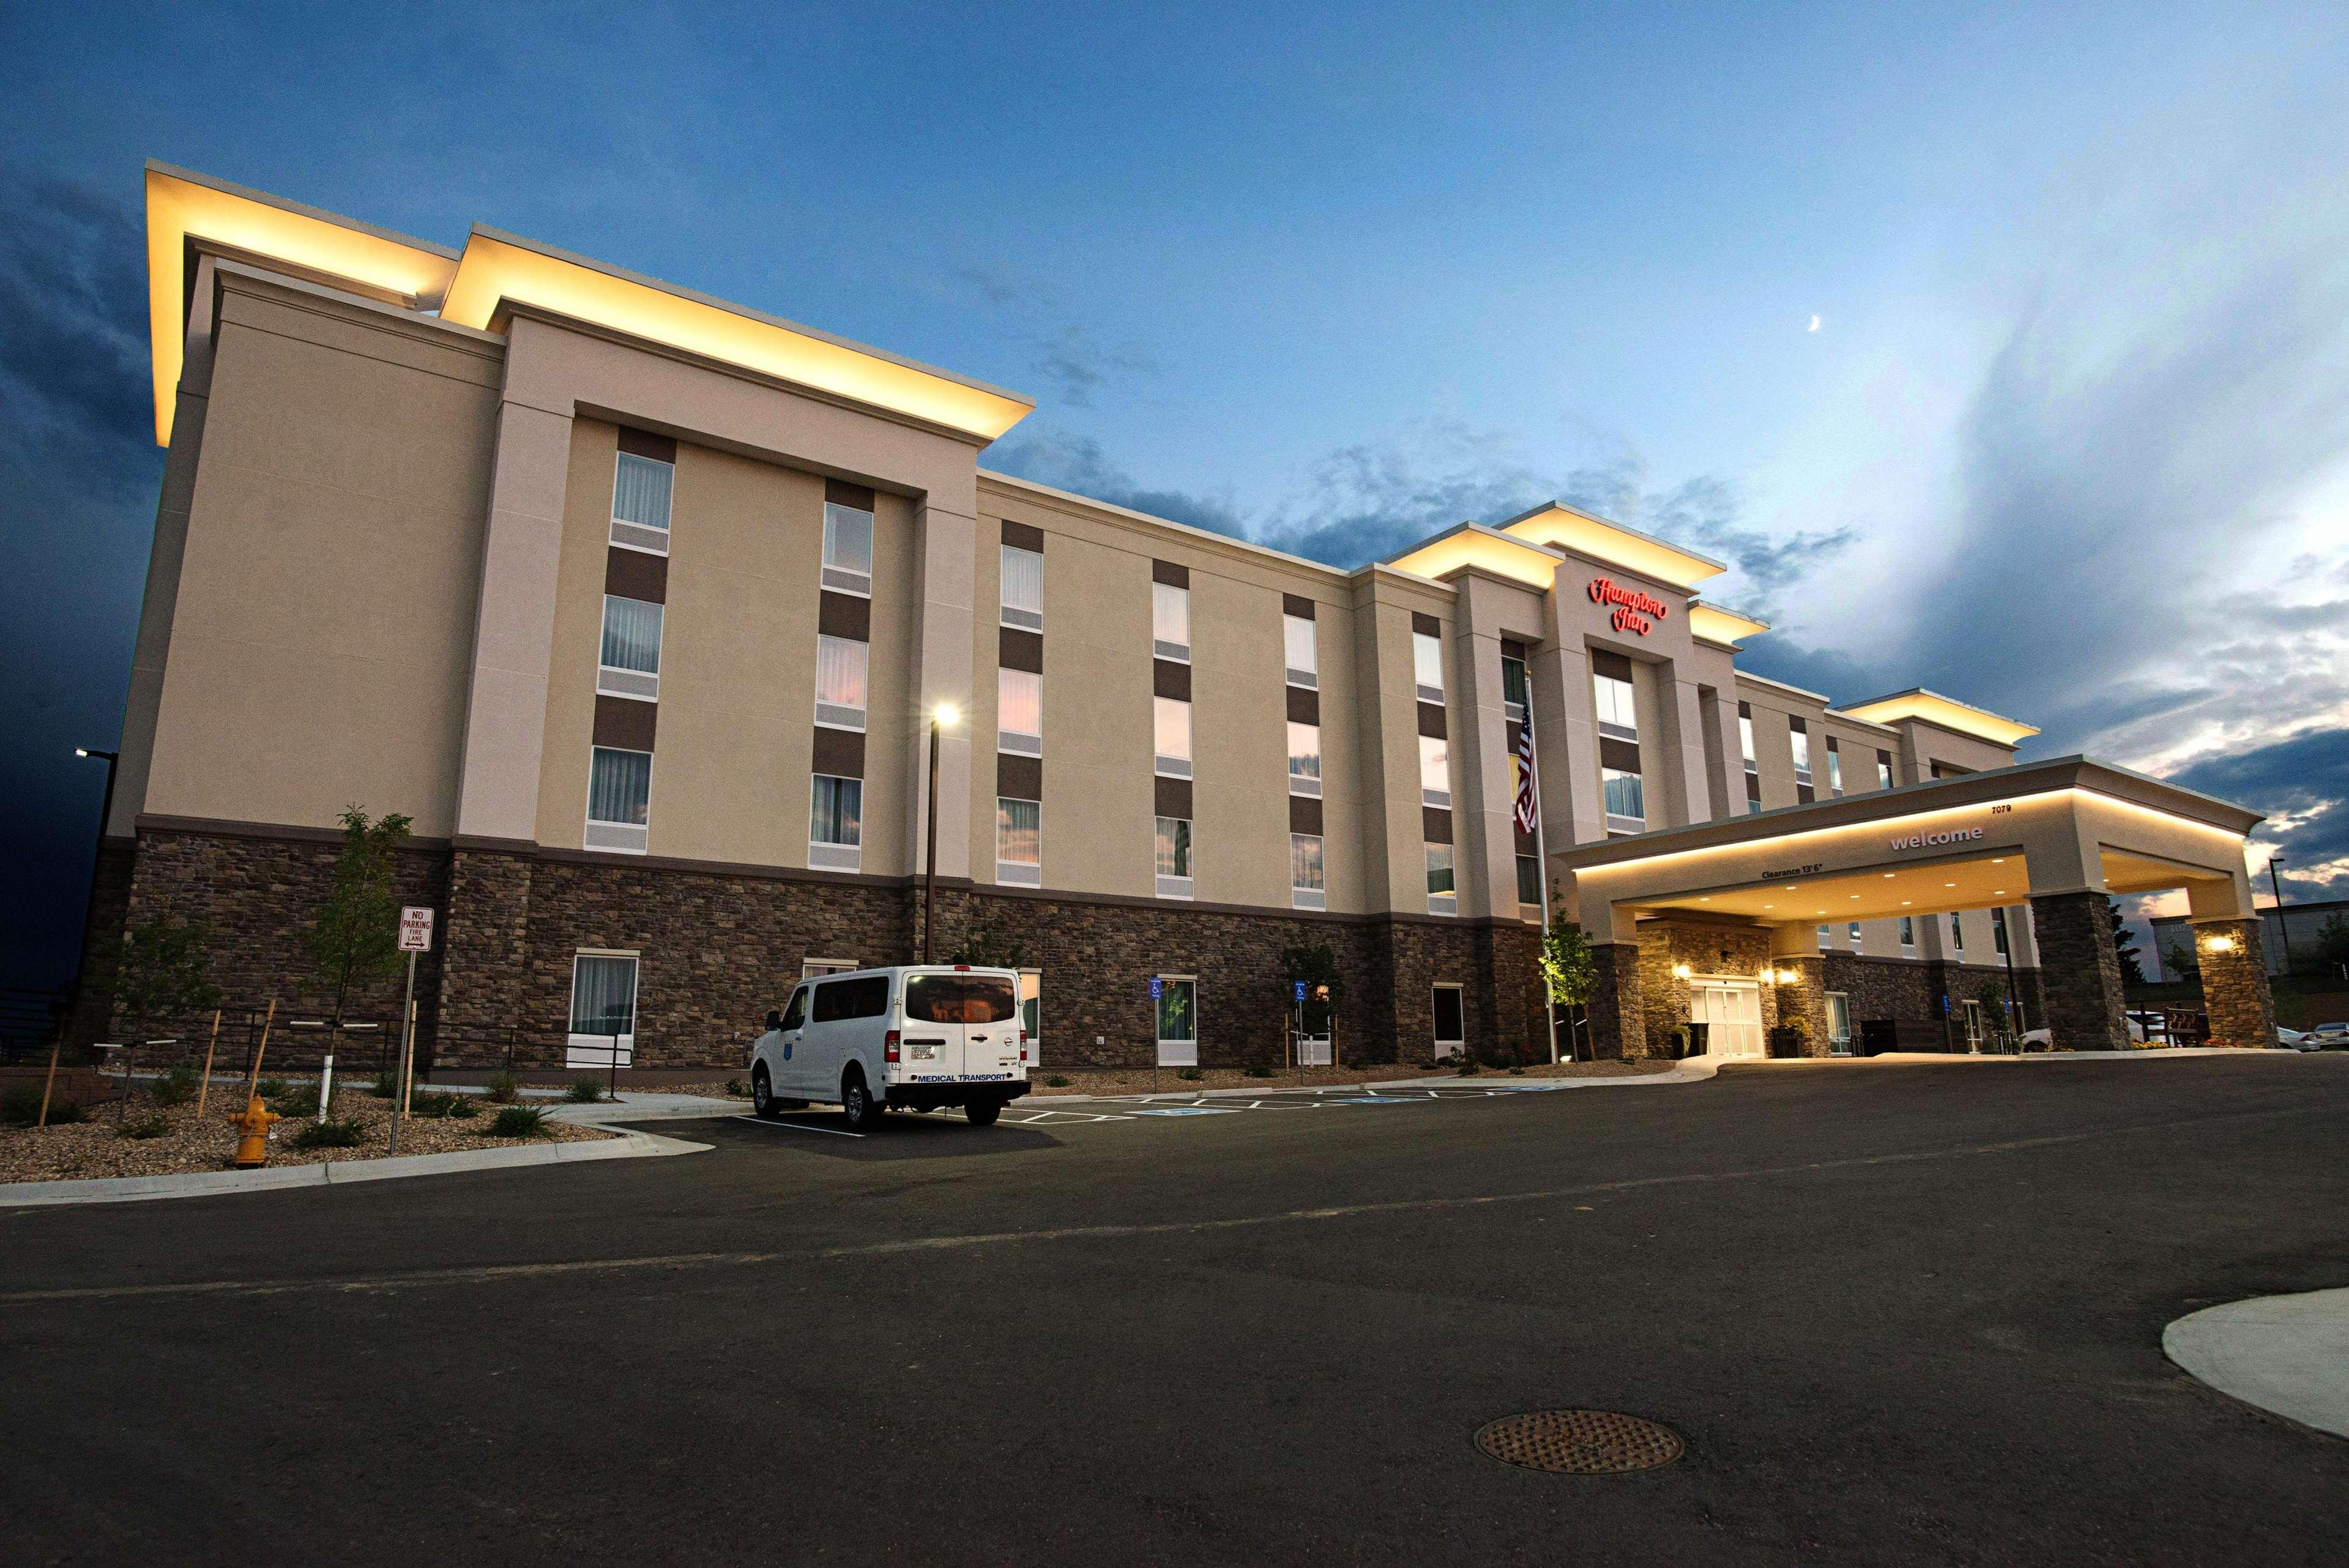 Hampton Inn Denver Tech Center South Centennial Colorado CO  LocalDatabasecom